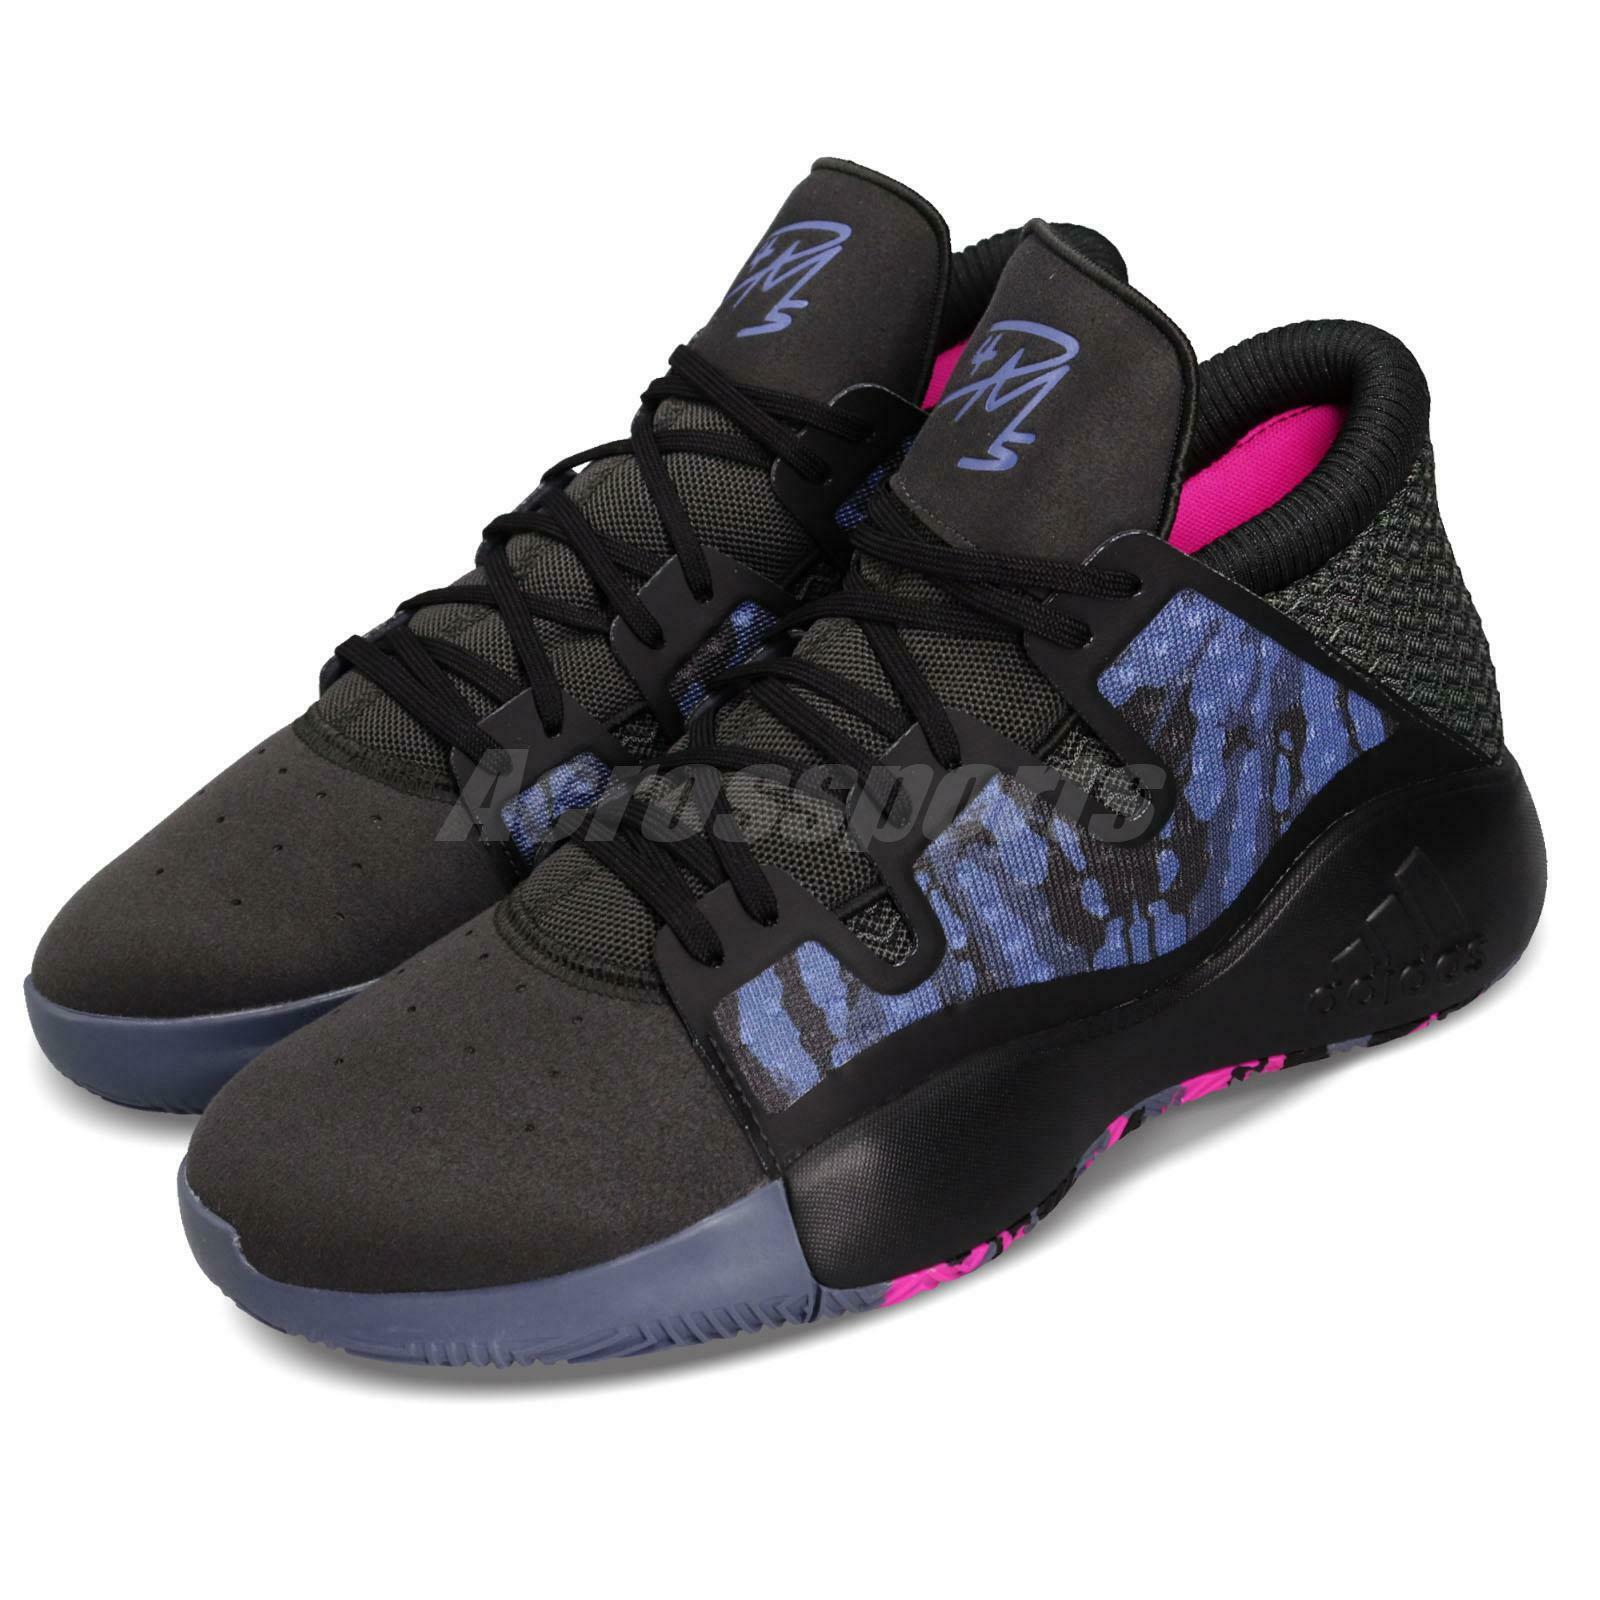 Adidas Pro Vision Select PE Donovan Mitchell gris negro azul Men zapatos EE6868